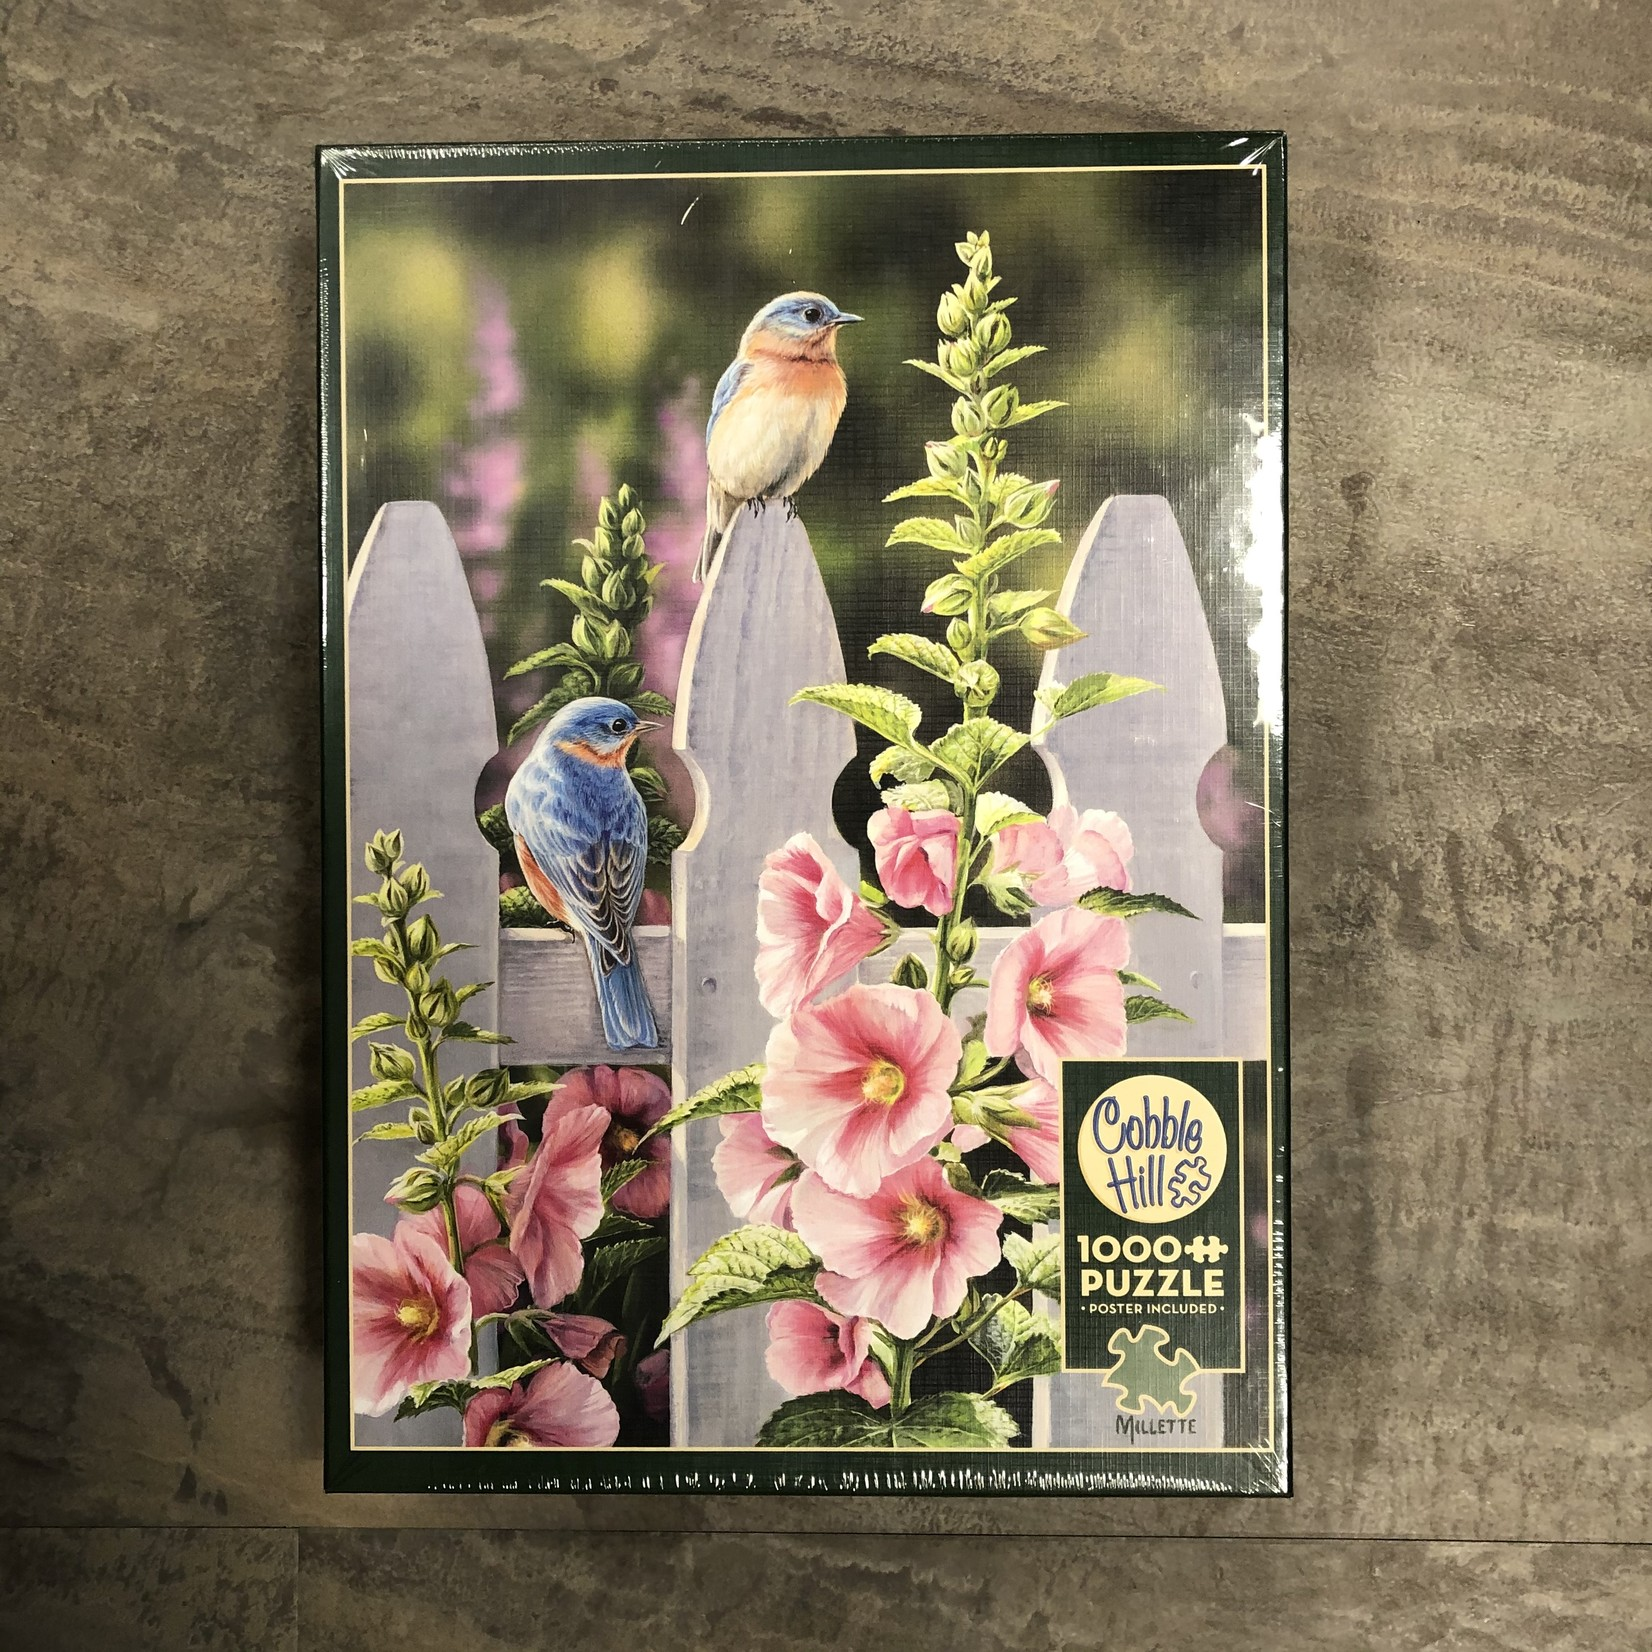 Cobble Hill Puzzles Bluebirds & Hollyhocks - 1000 pc Puzzle